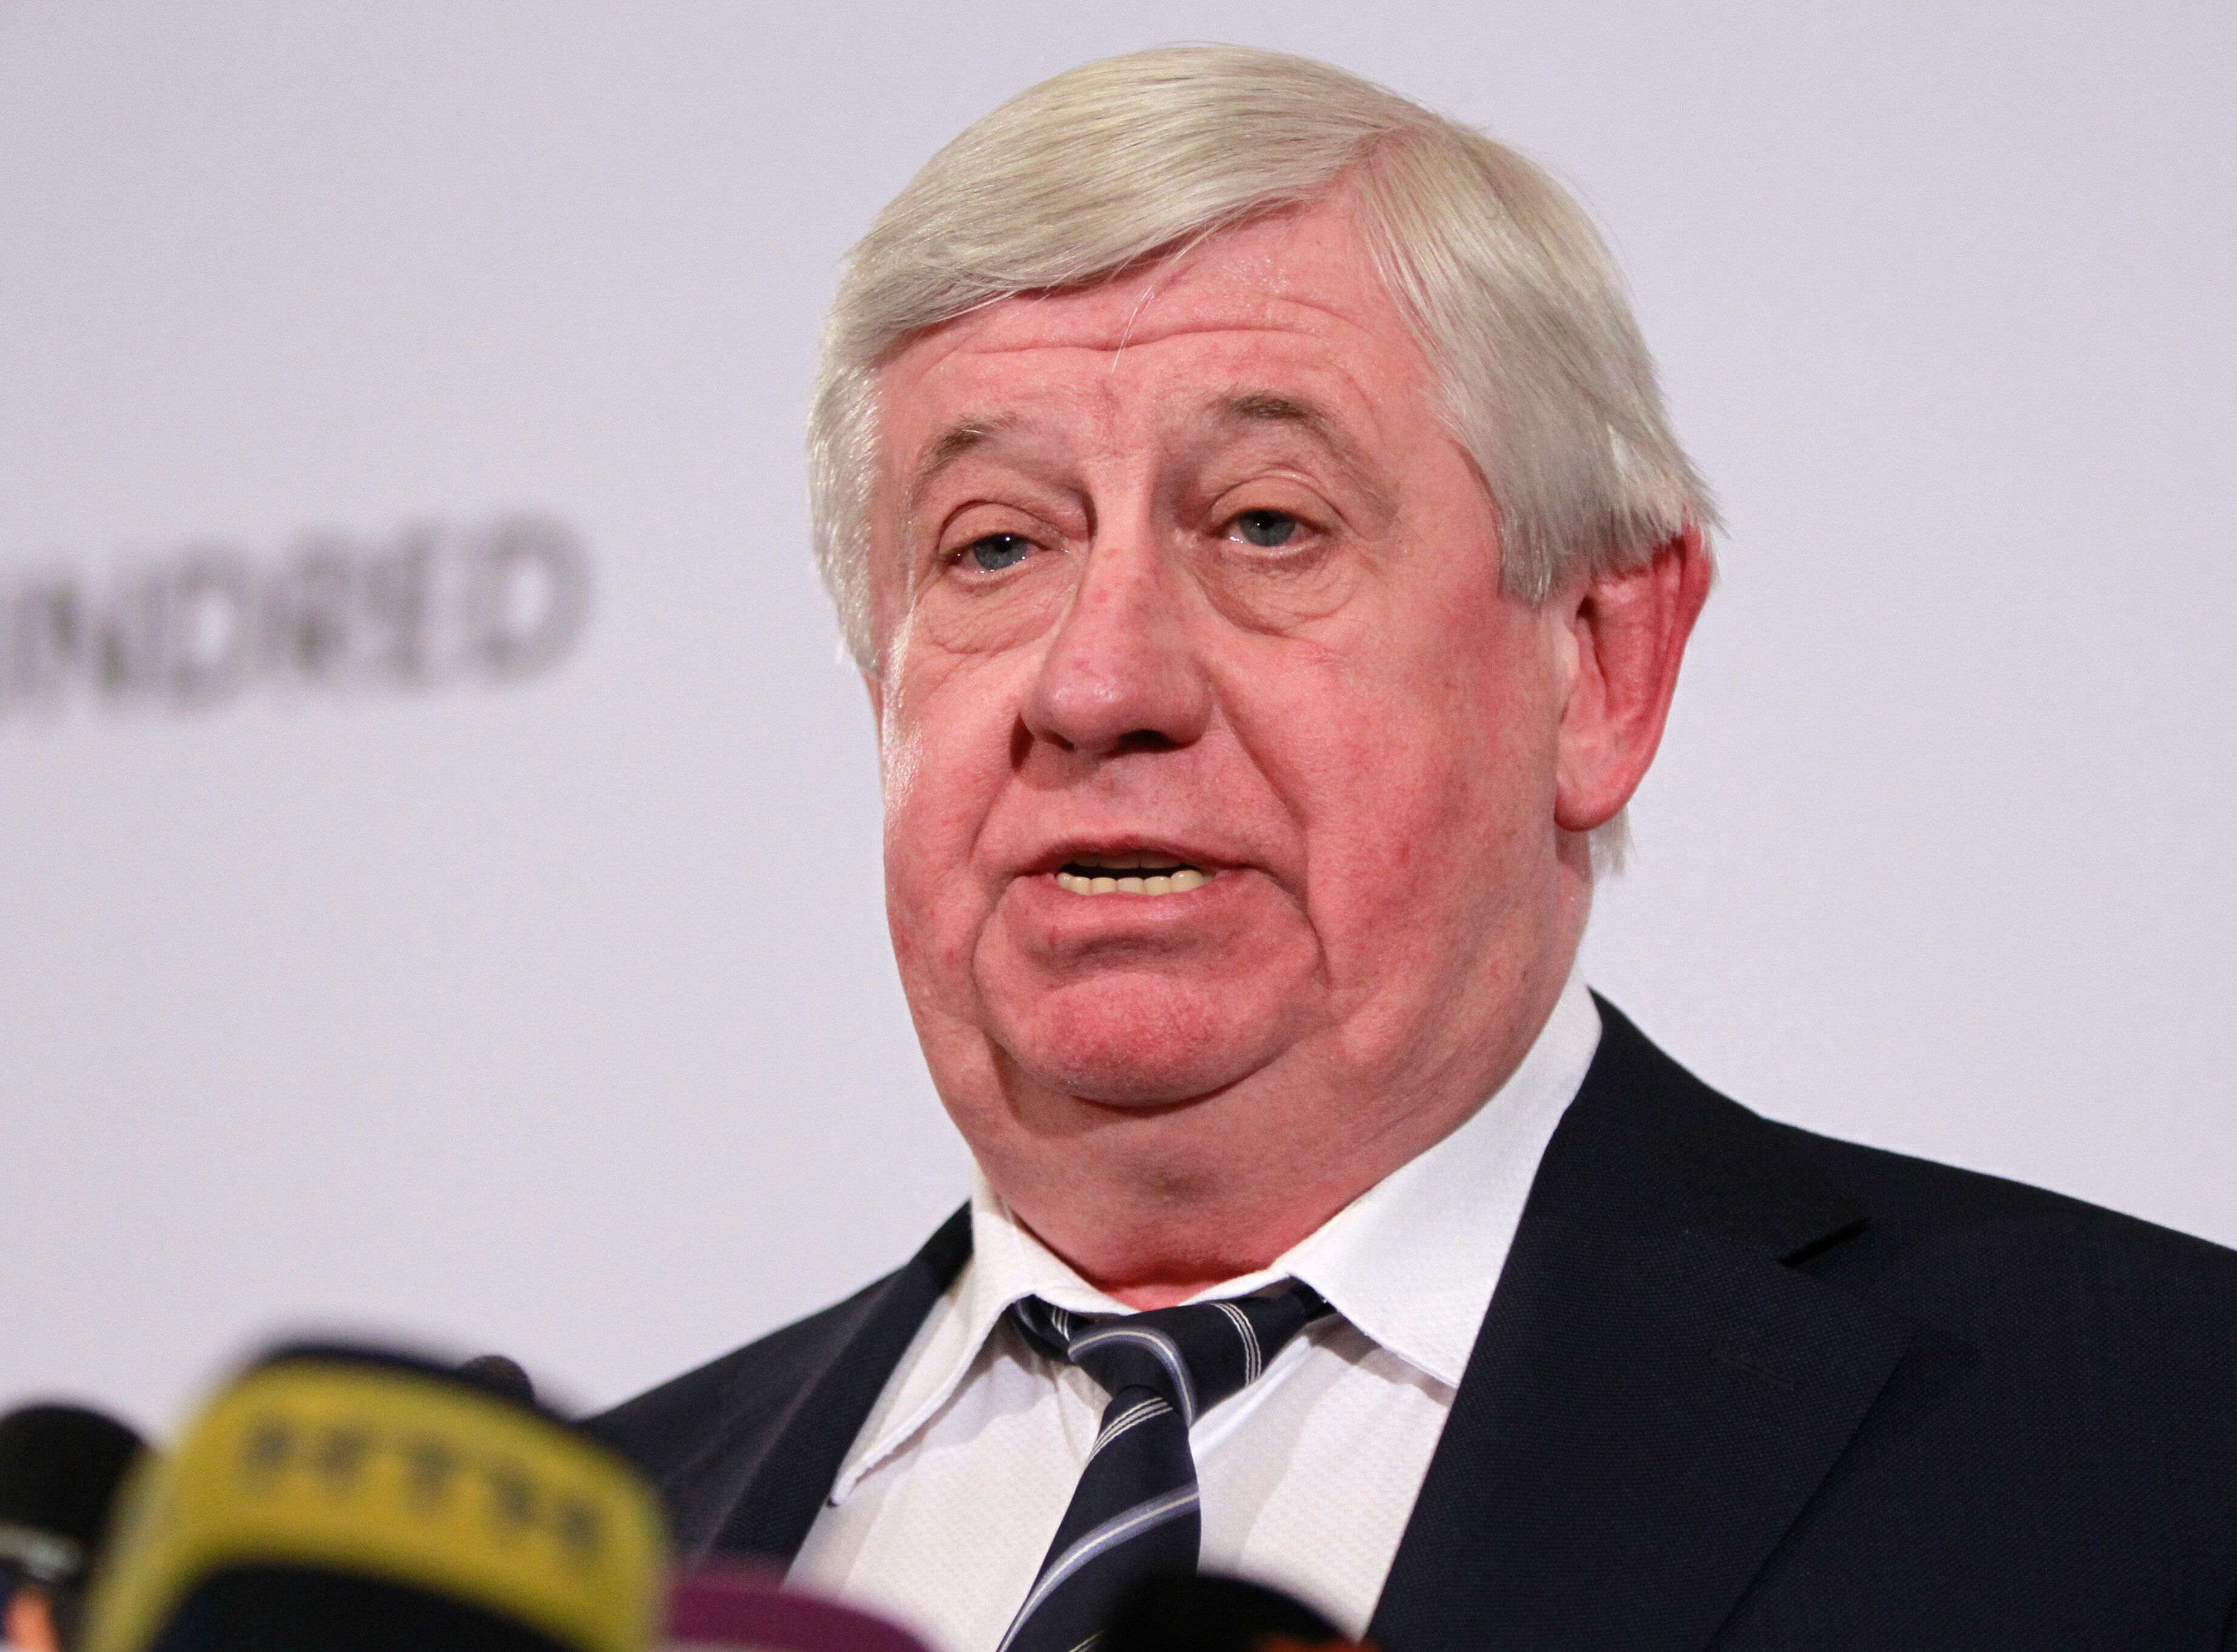 Viktor Shokin, Ukraine's former top prosecutor, was criticized for not pursuing corruption investigations.